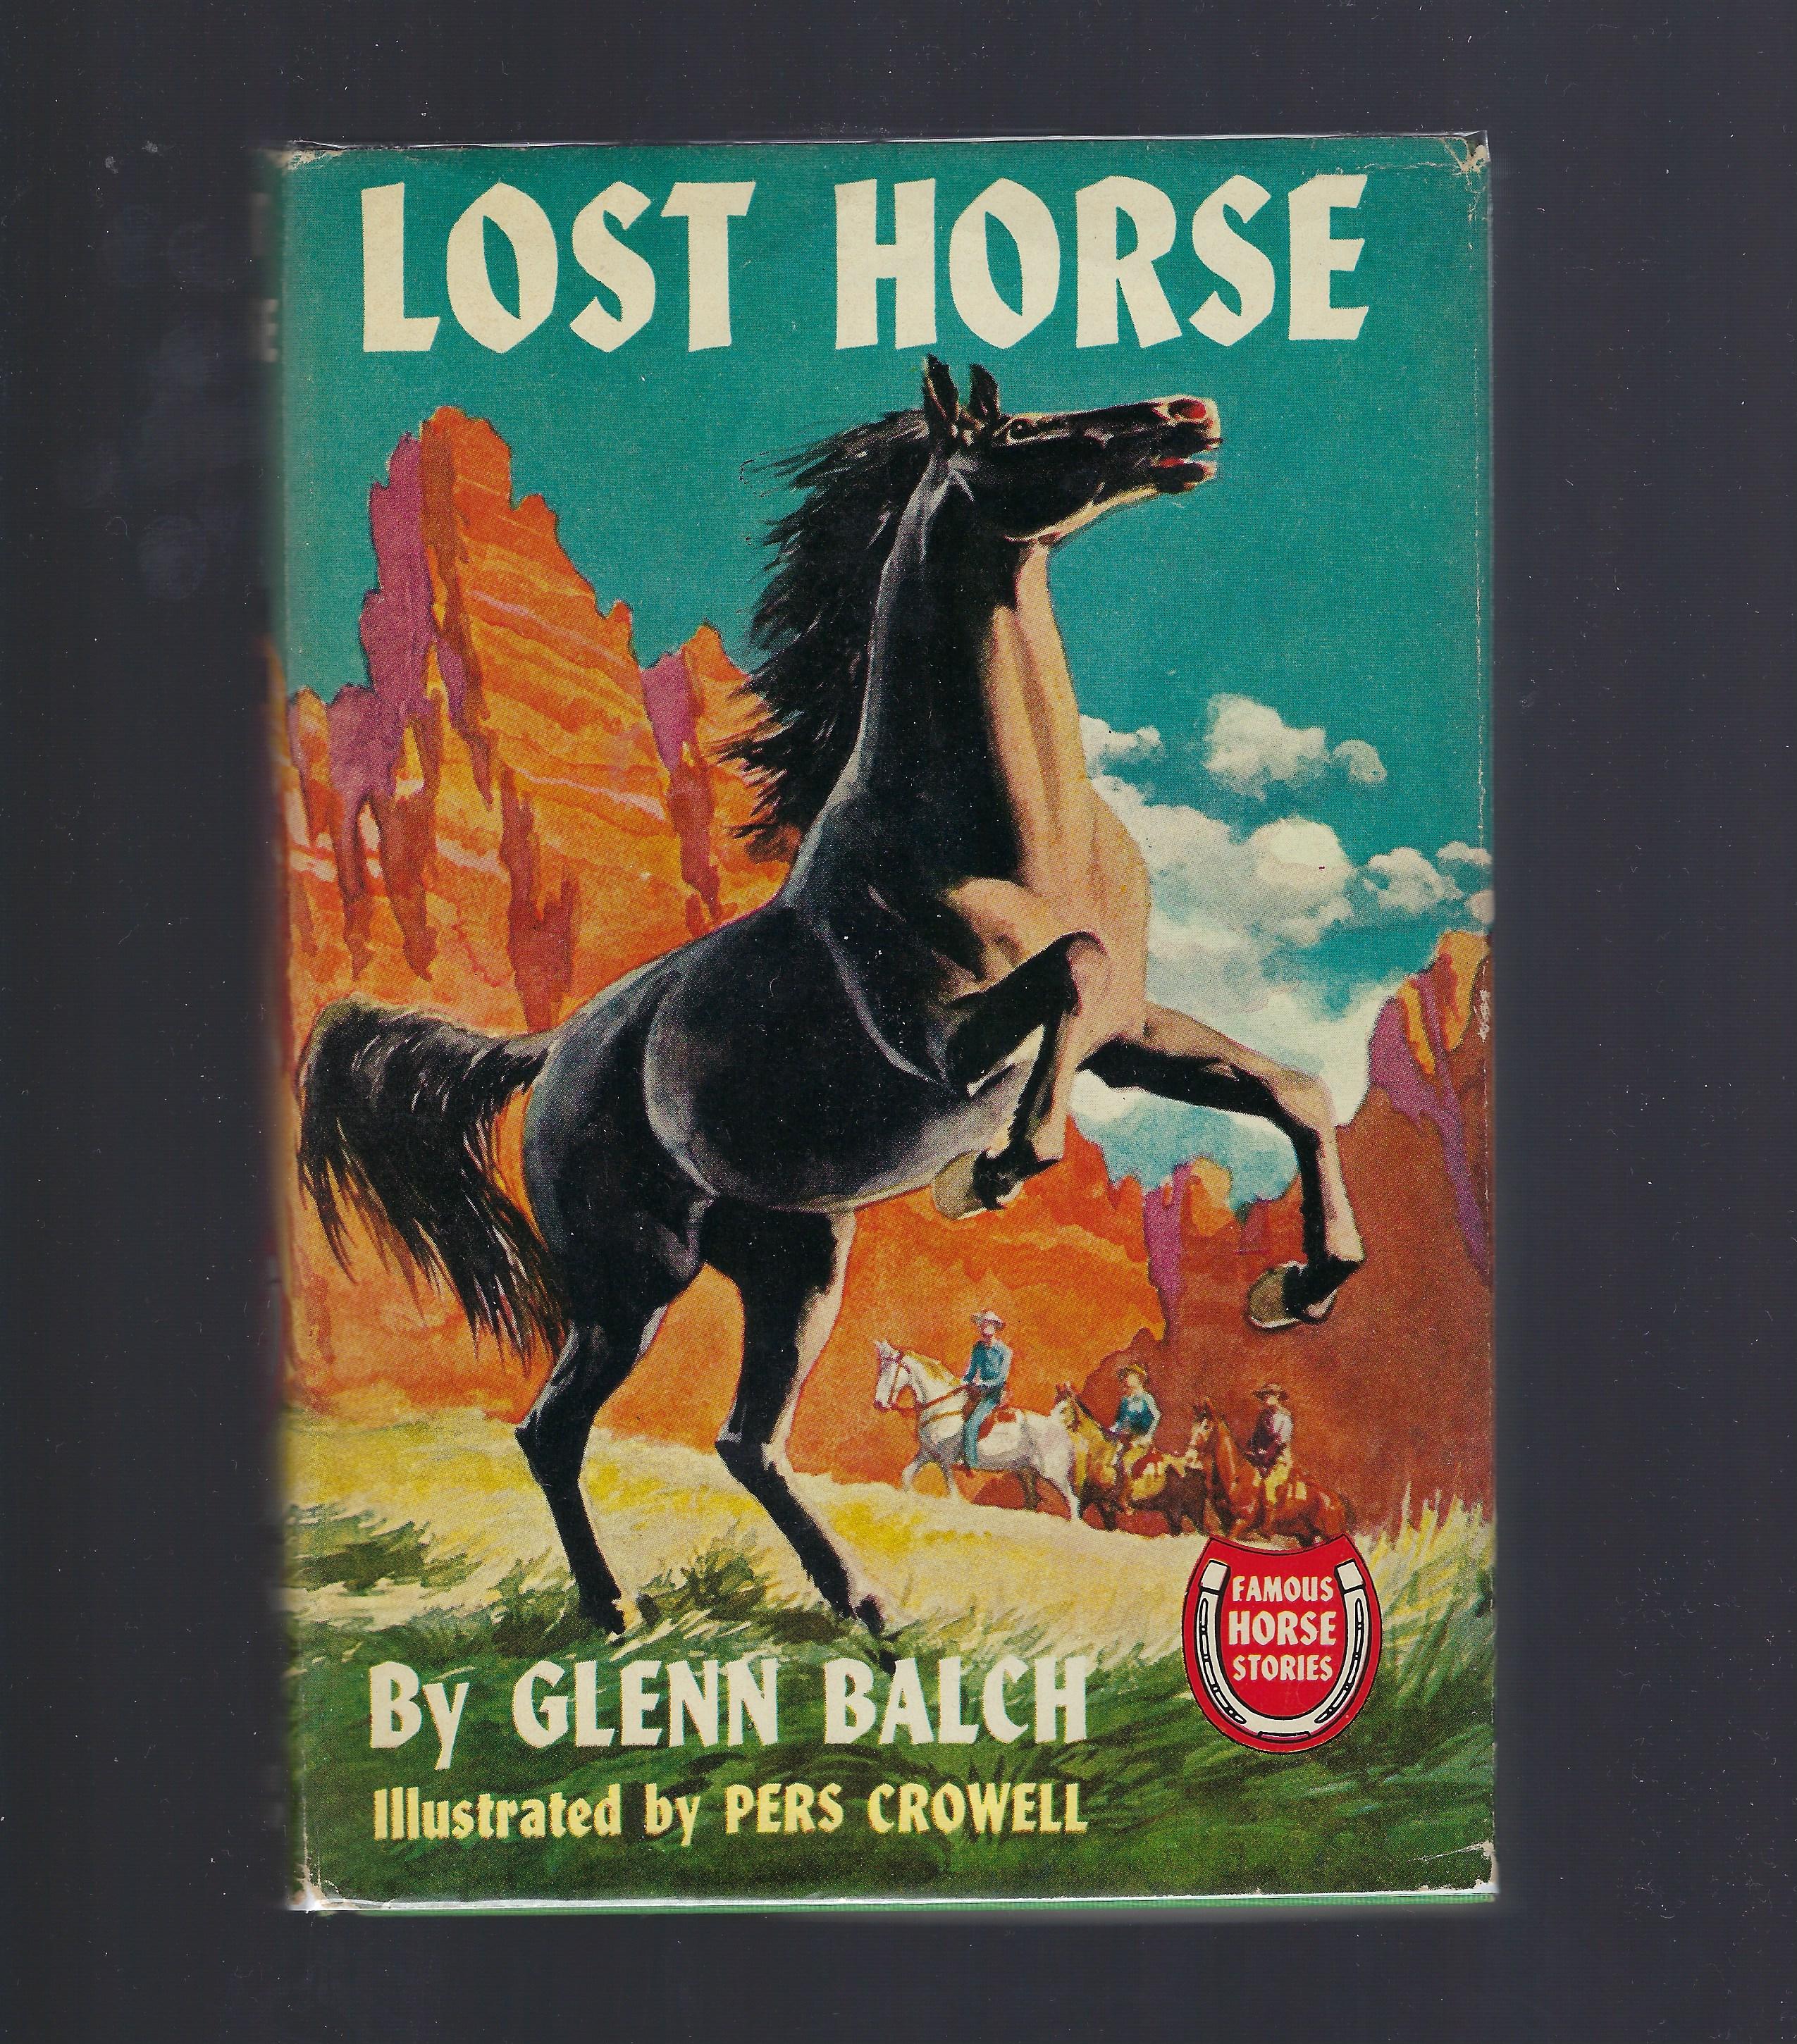 Lost Horse (Famous Horse Stories) HB/DJ Glenn Balch, Balch, Glenn; Pers Crowell [Illustrator]